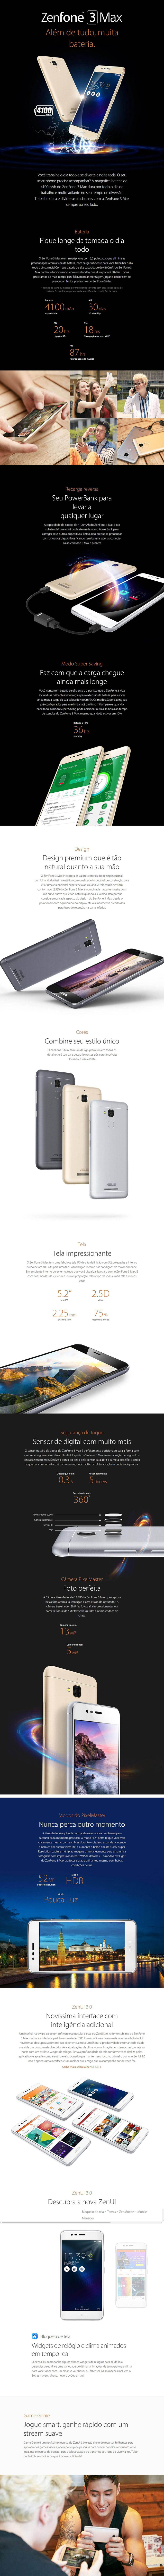 Smartphone ASUS ZenFone 3 Max 16GB Dual Chip 4G Tela 5,2 Câmera 13MP Selfie 5MP Android 6.0